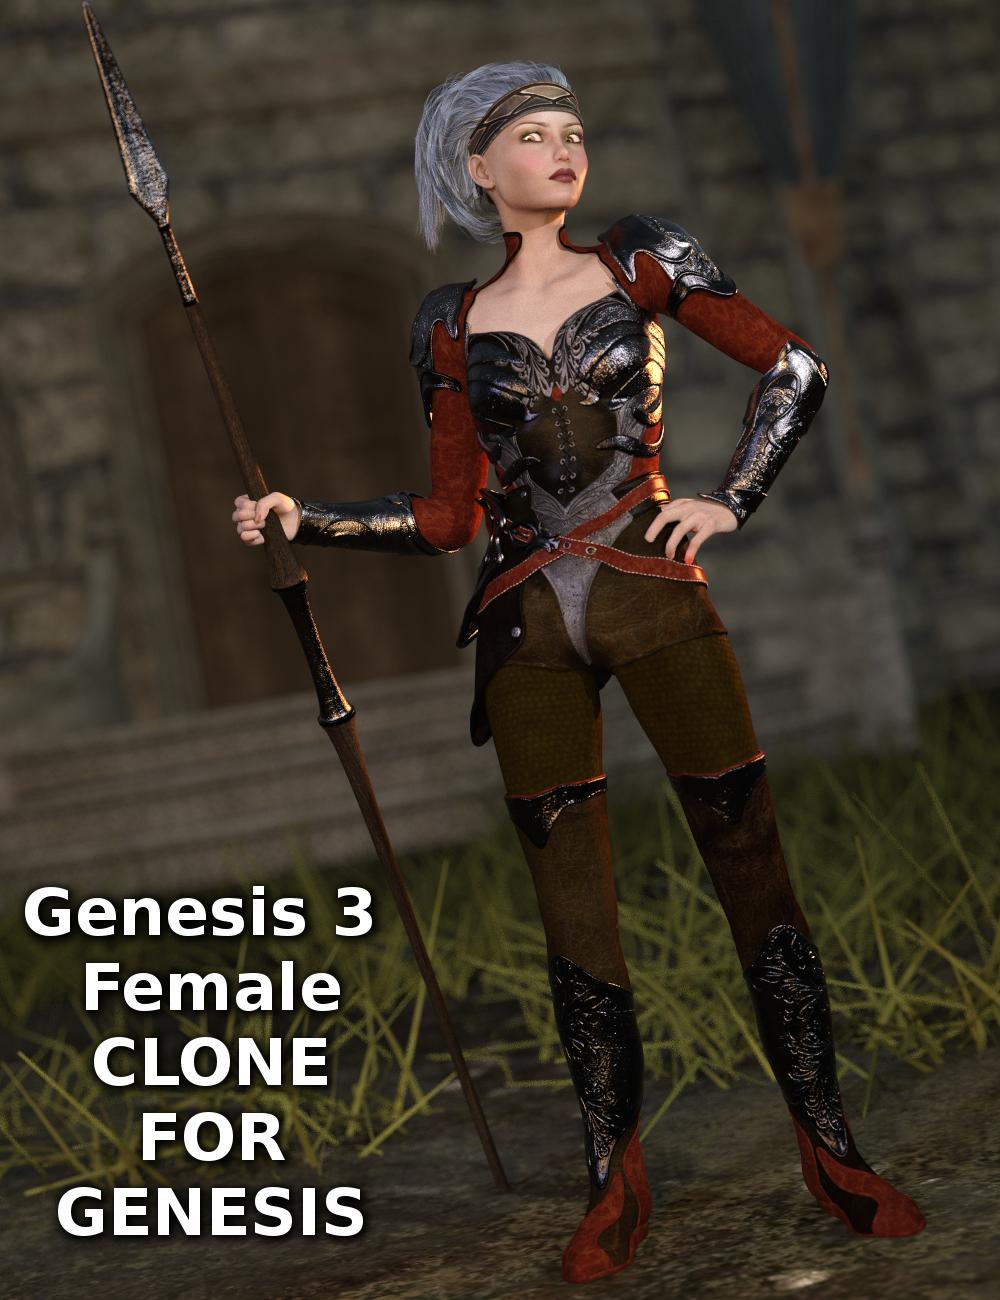 Genesis 3 Female Clone for Genesis by: Sickleyield, 3D Models by Daz 3D